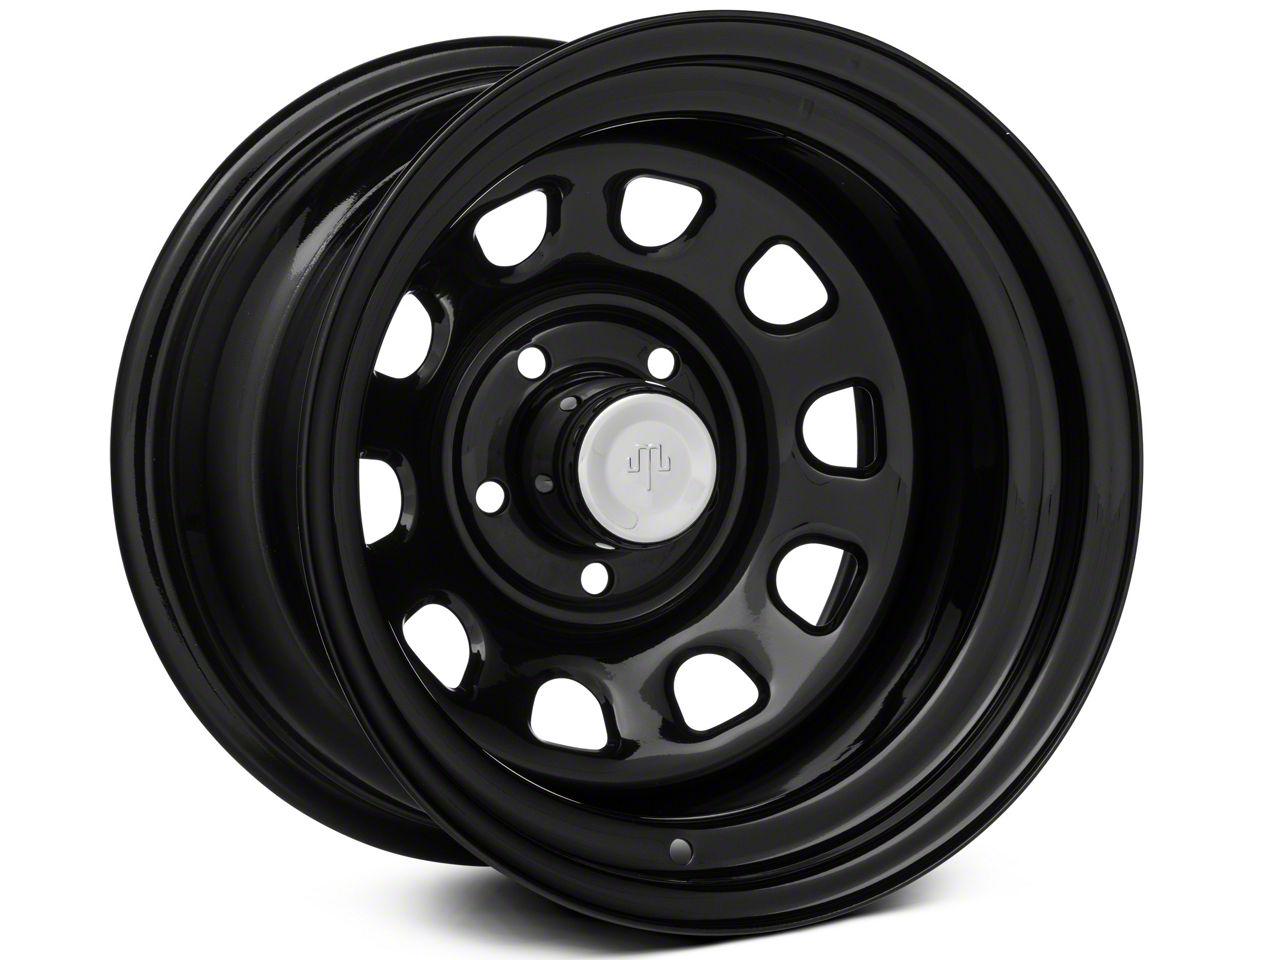 Mammoth D Window Black Steel Wheel 15x10 Wheel & Mickey Thompson Baja MTZP3 31x10.50R15 Tire Kit (87-06 Jeep Wrangler YJ & TJ)